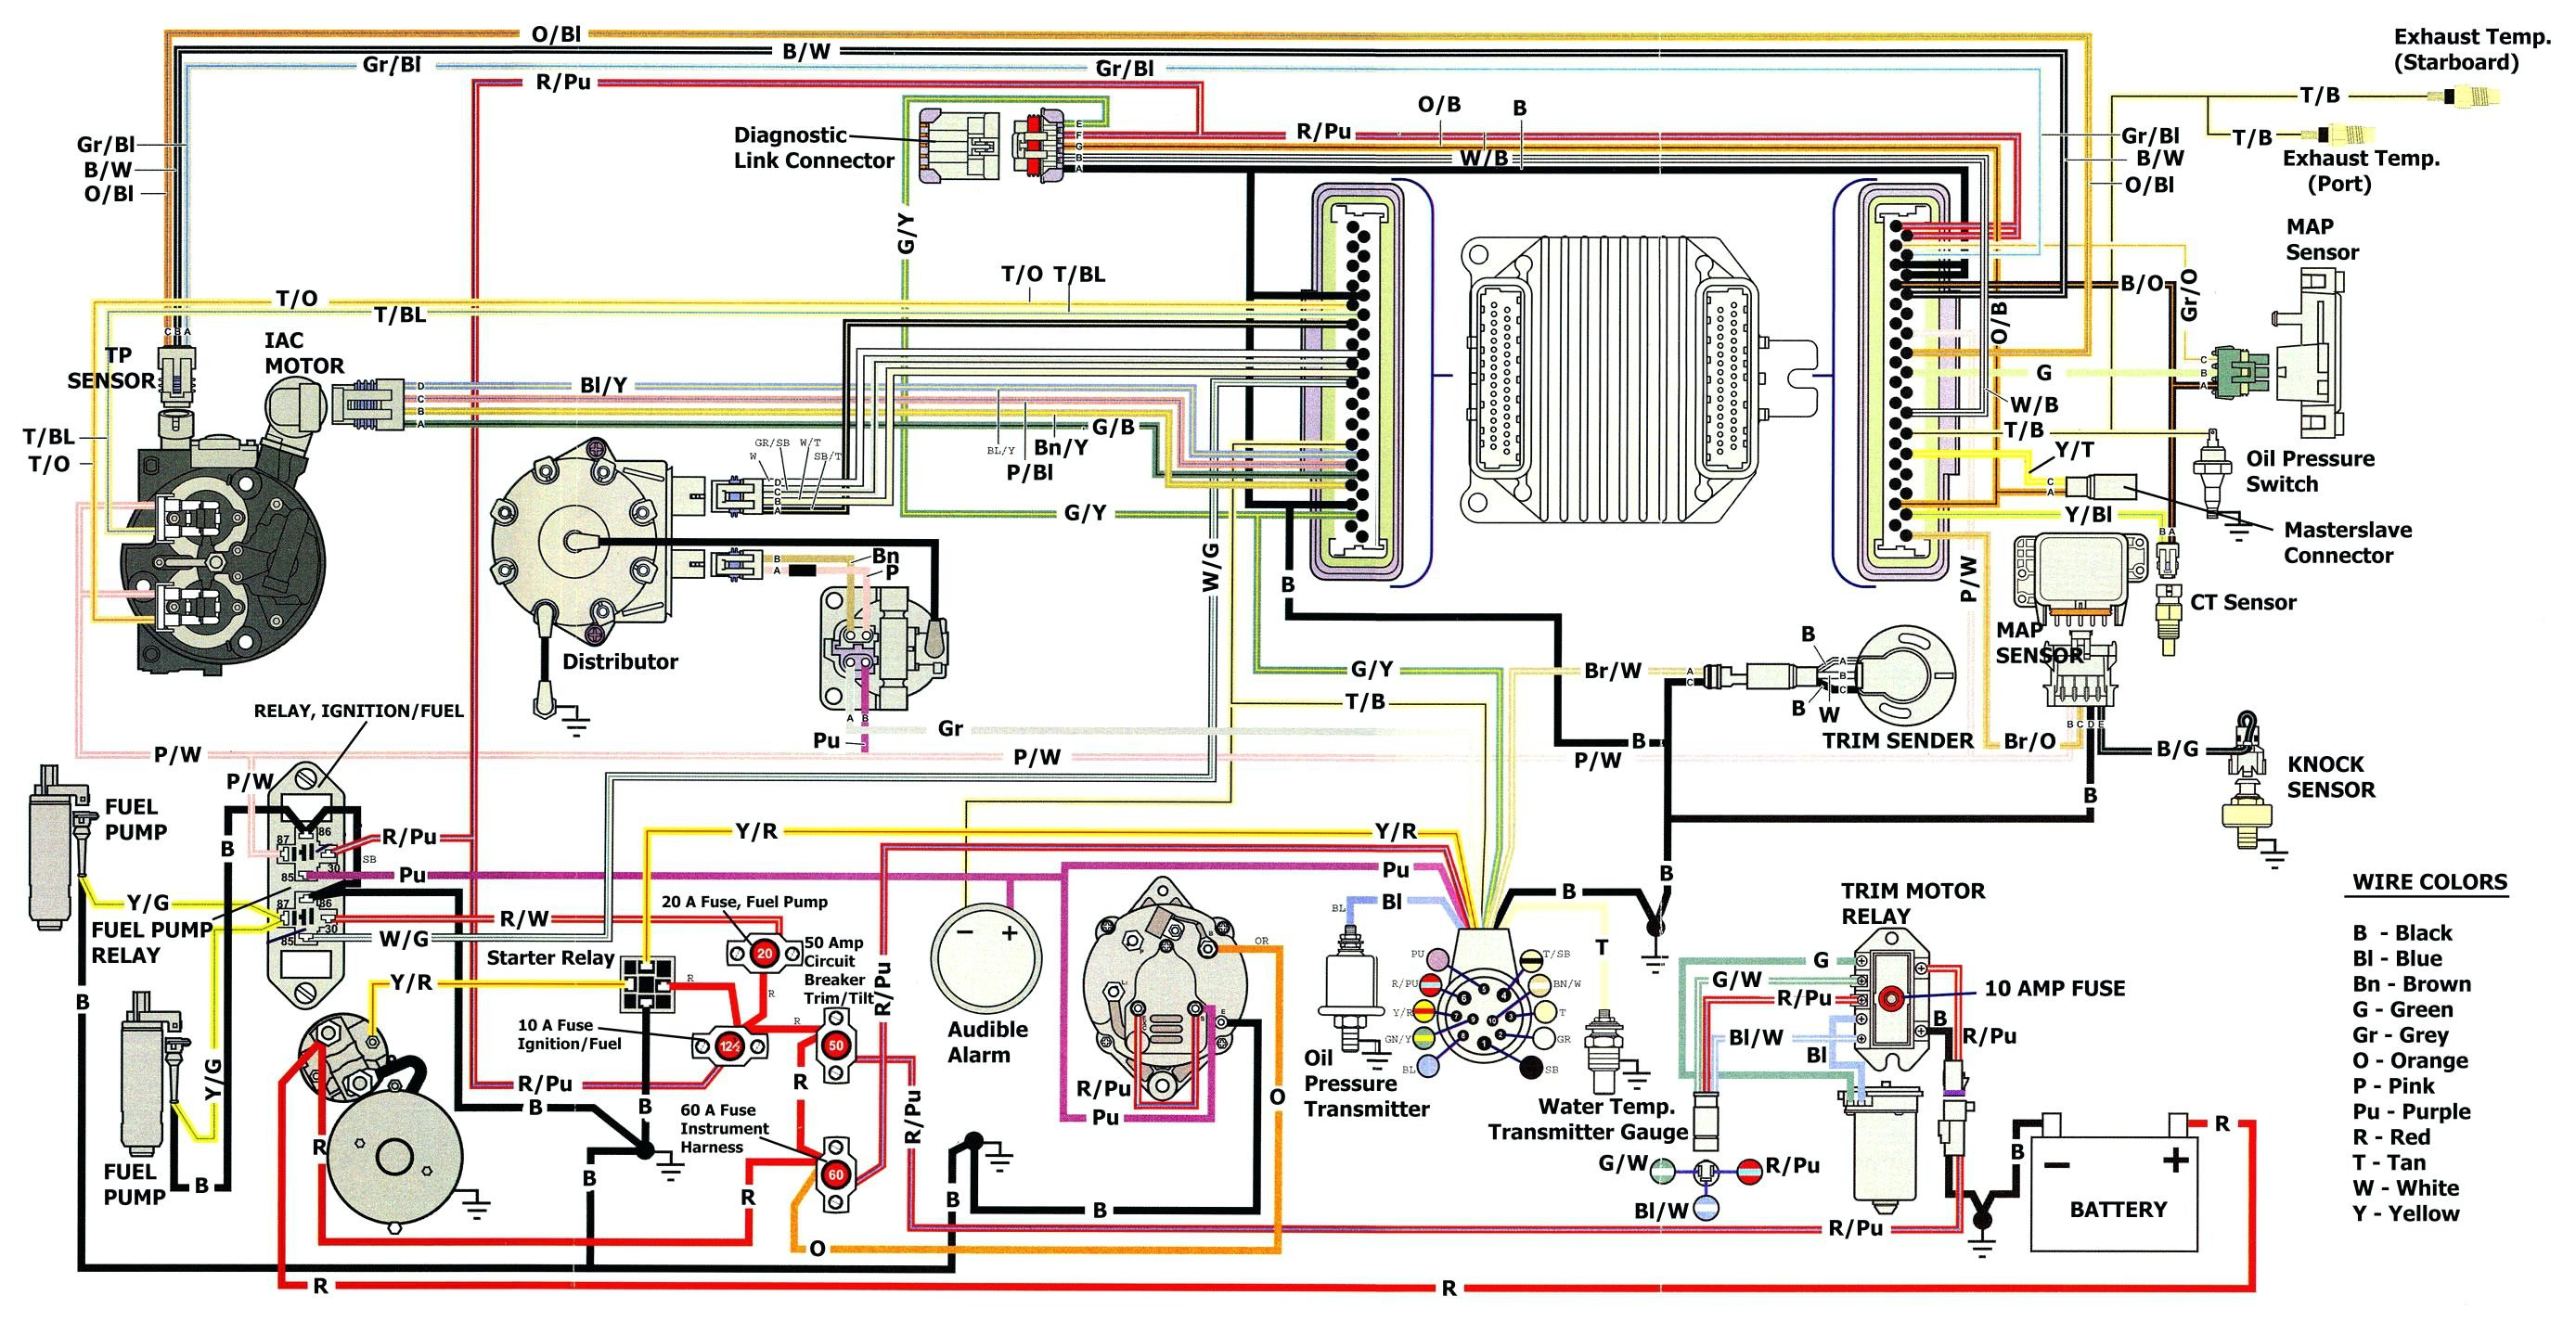 Volvo V70 Engine Diagram Volvo V70 Electrical Schematic Awesome Lighter Wiring Diagram Of Volvo V70 Engine Diagram